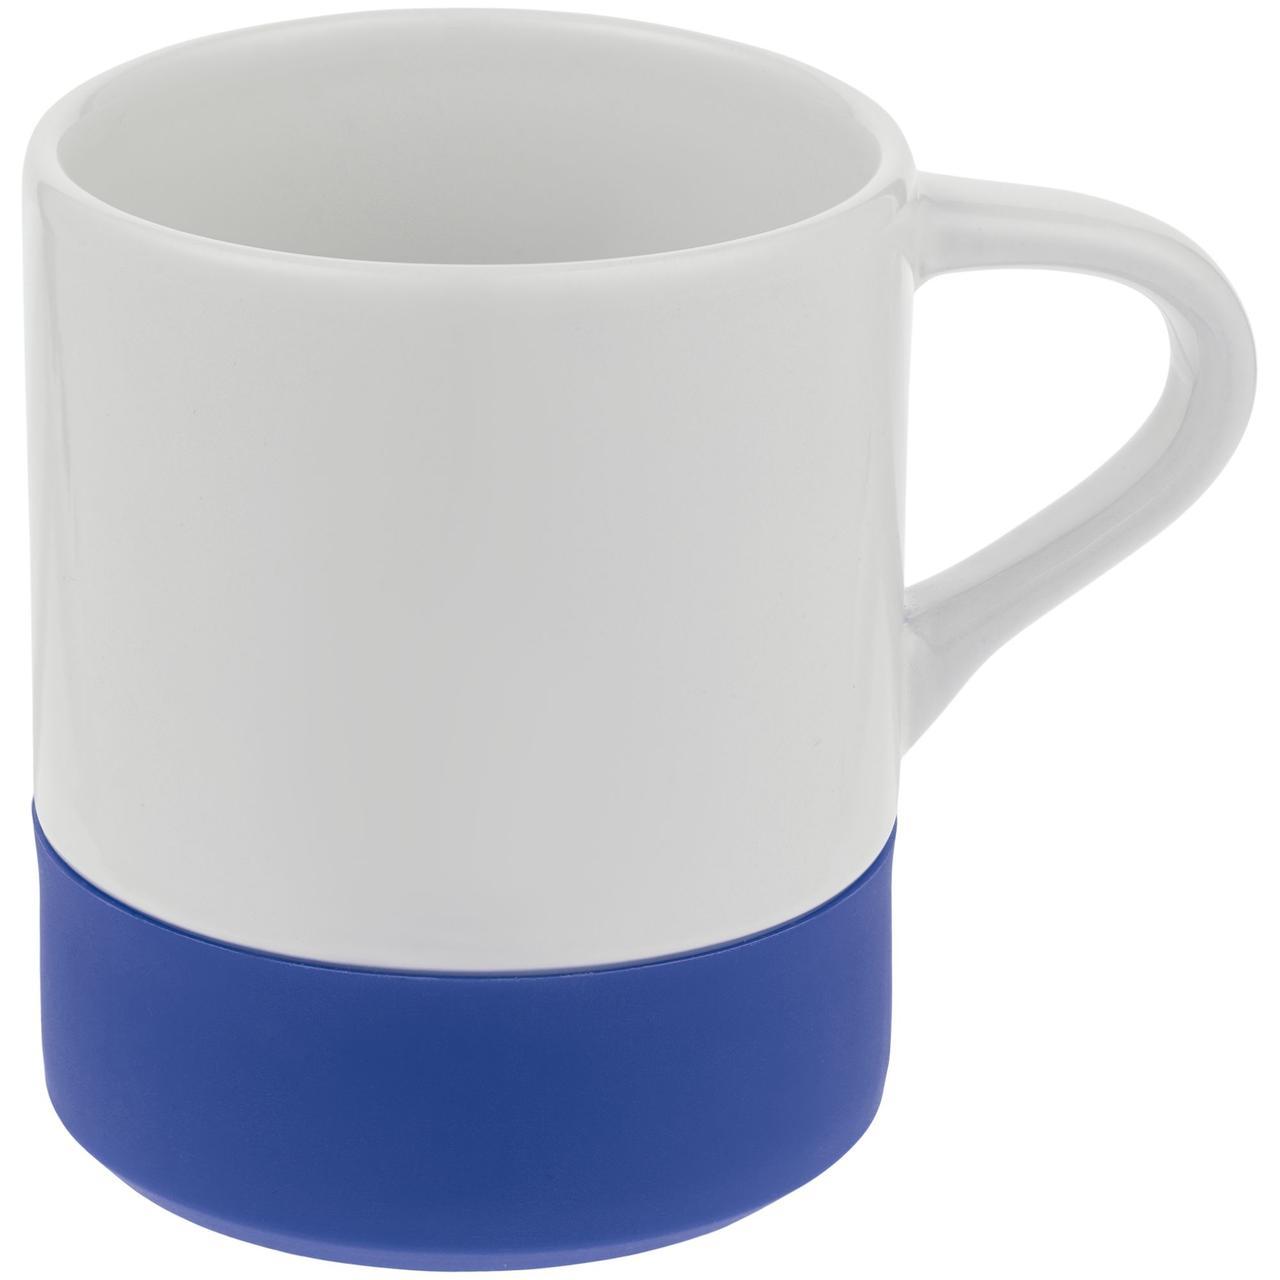 Кружка с силиконовой подставкой Protege , синяя (артикул 12892.40)